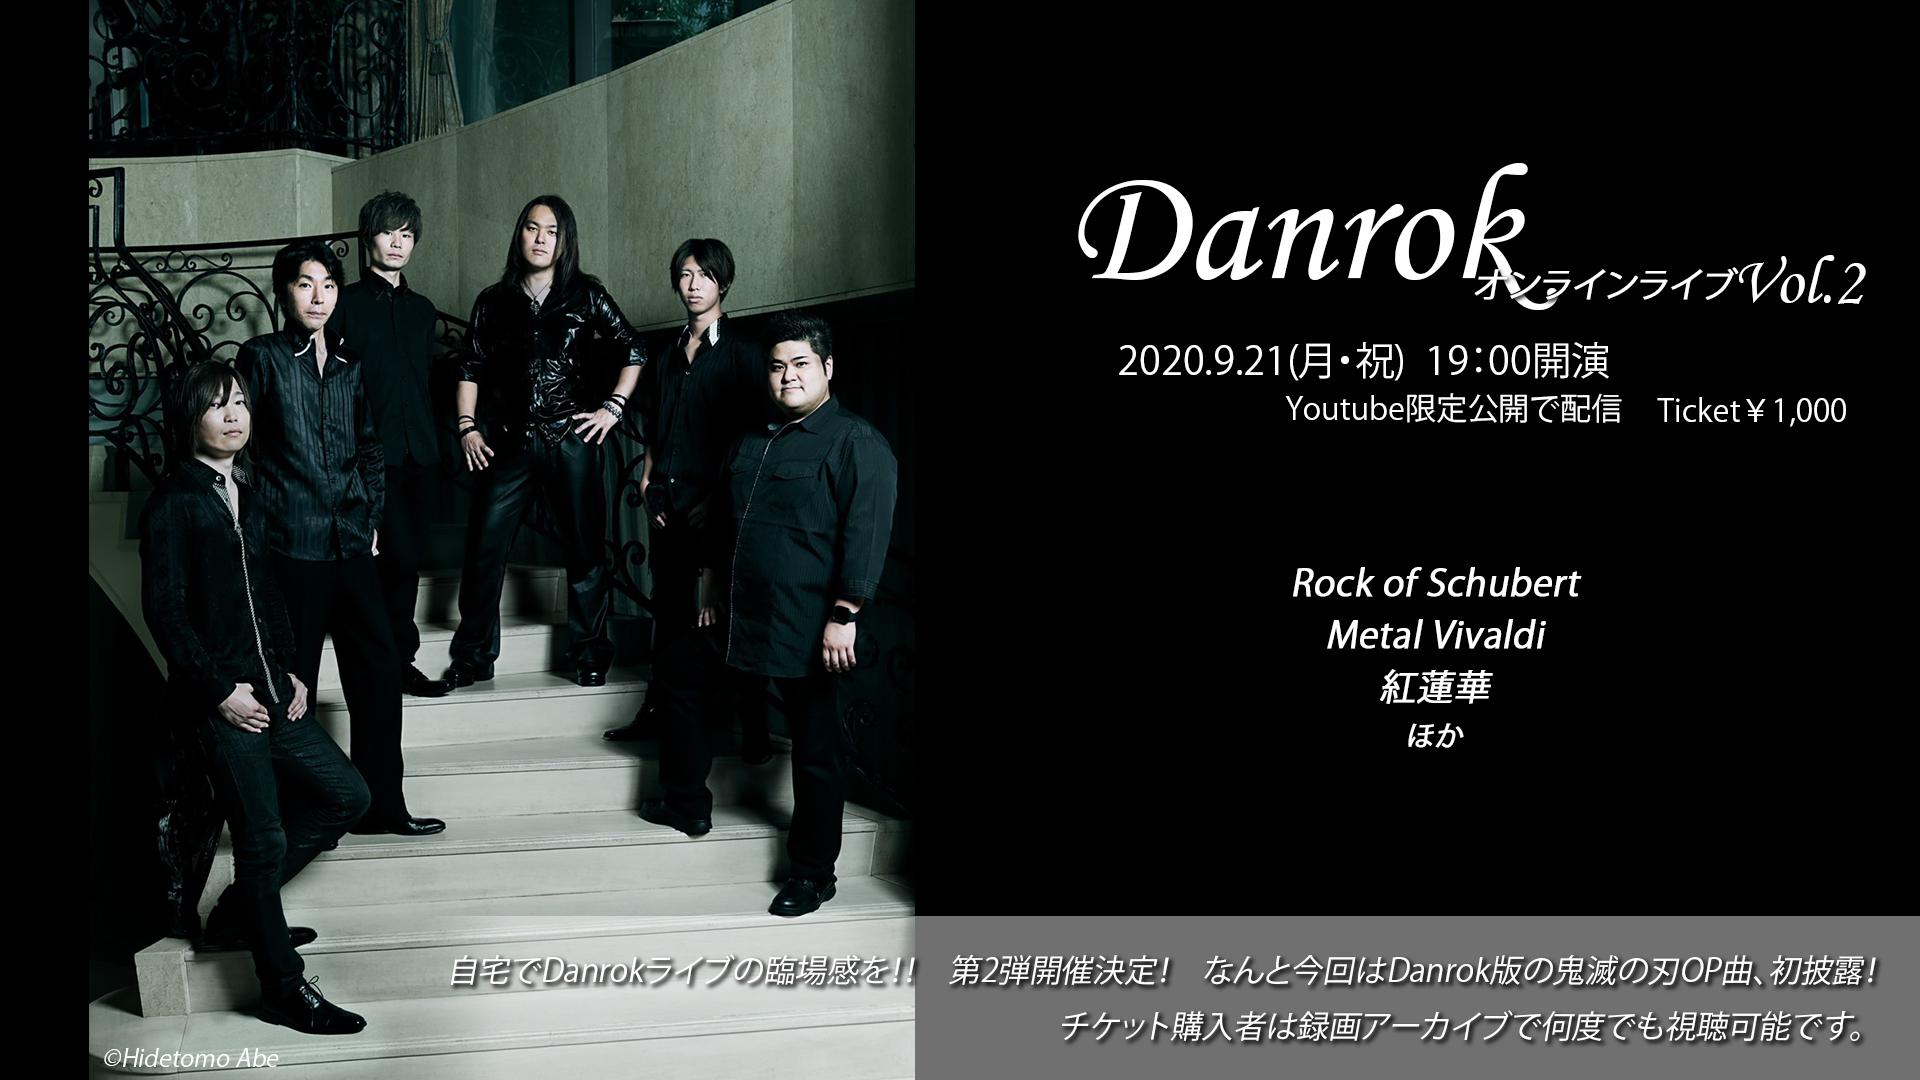 2020.9.21 DANROKオンラインコンサート